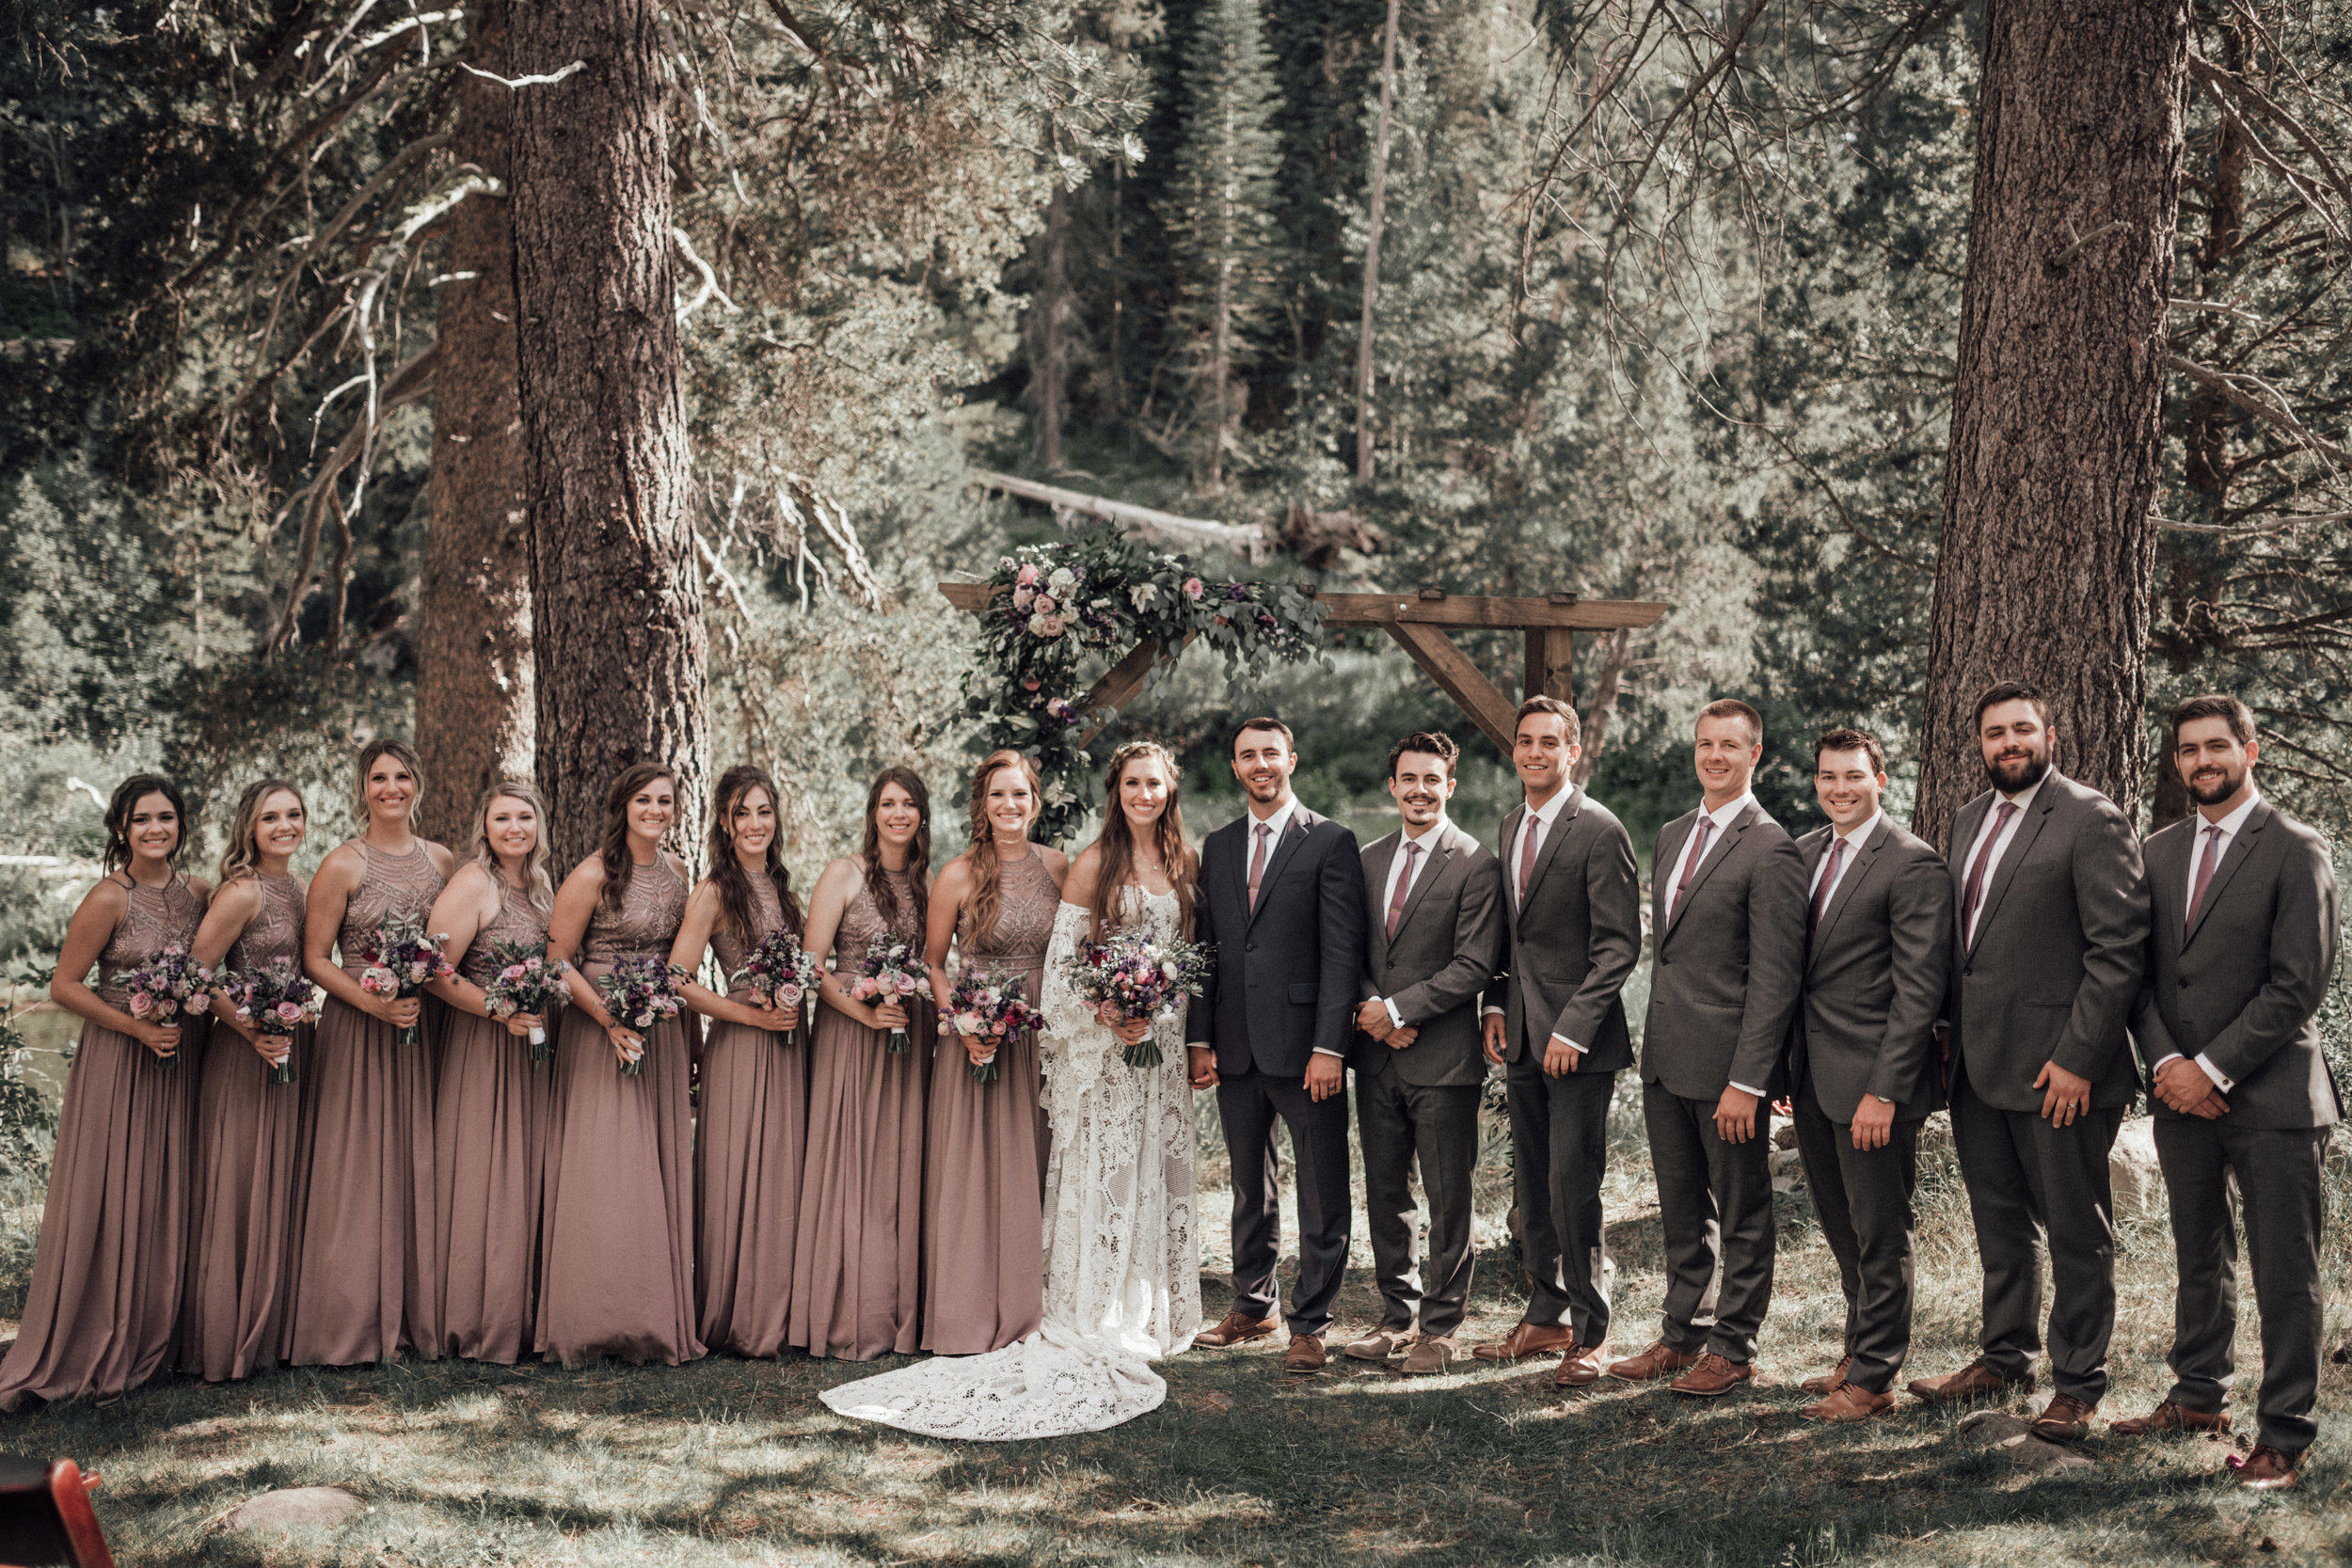 may-wedding-dancing-pines-sierraville-wedding-ca-danielle-kyle-junebug-photography-lake-tahoe-1-1413.jpg